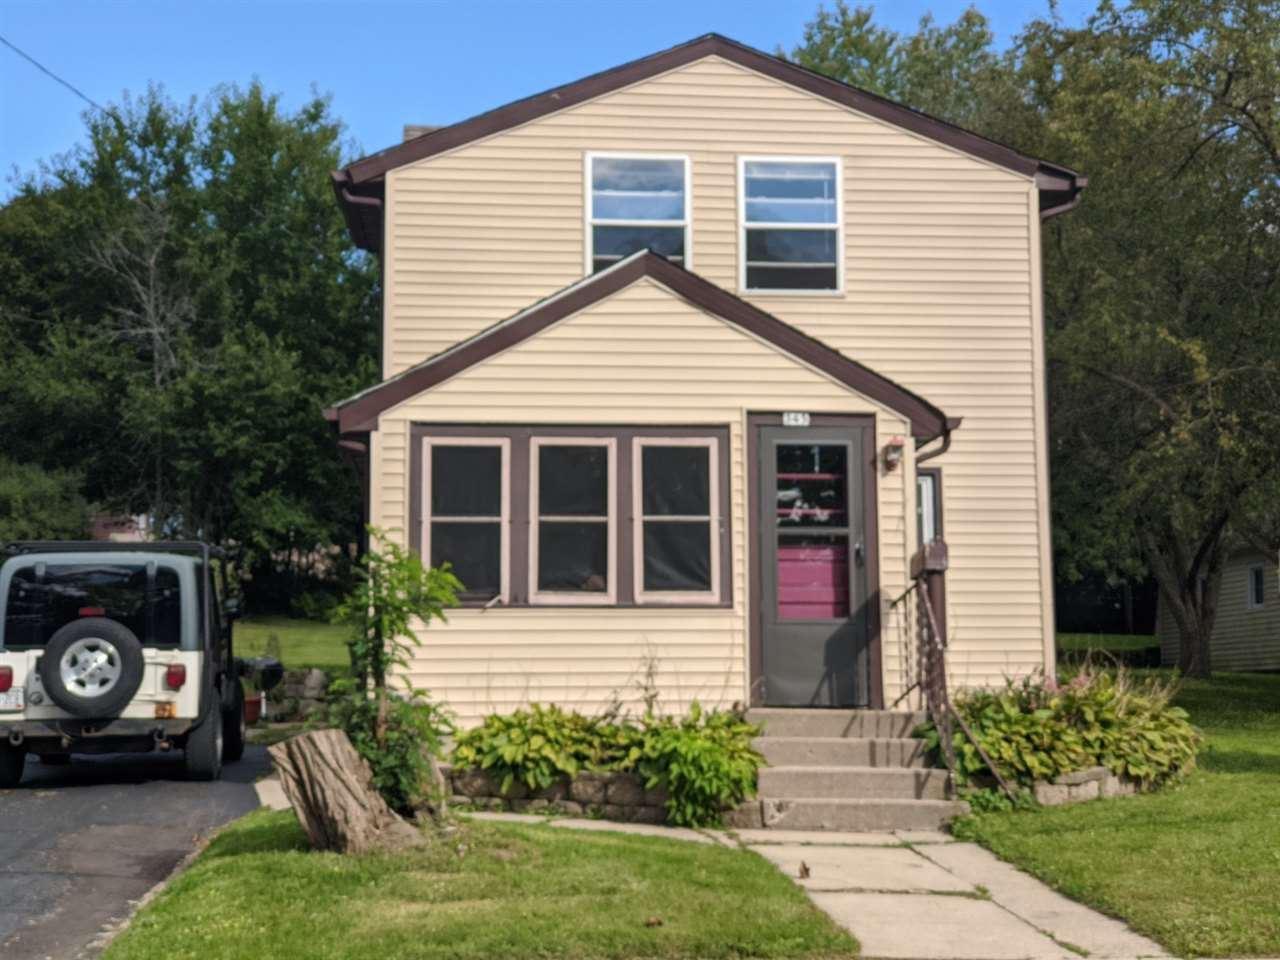 345 N Jefferson St, Whitewater, WI 53190 - #: 1893920